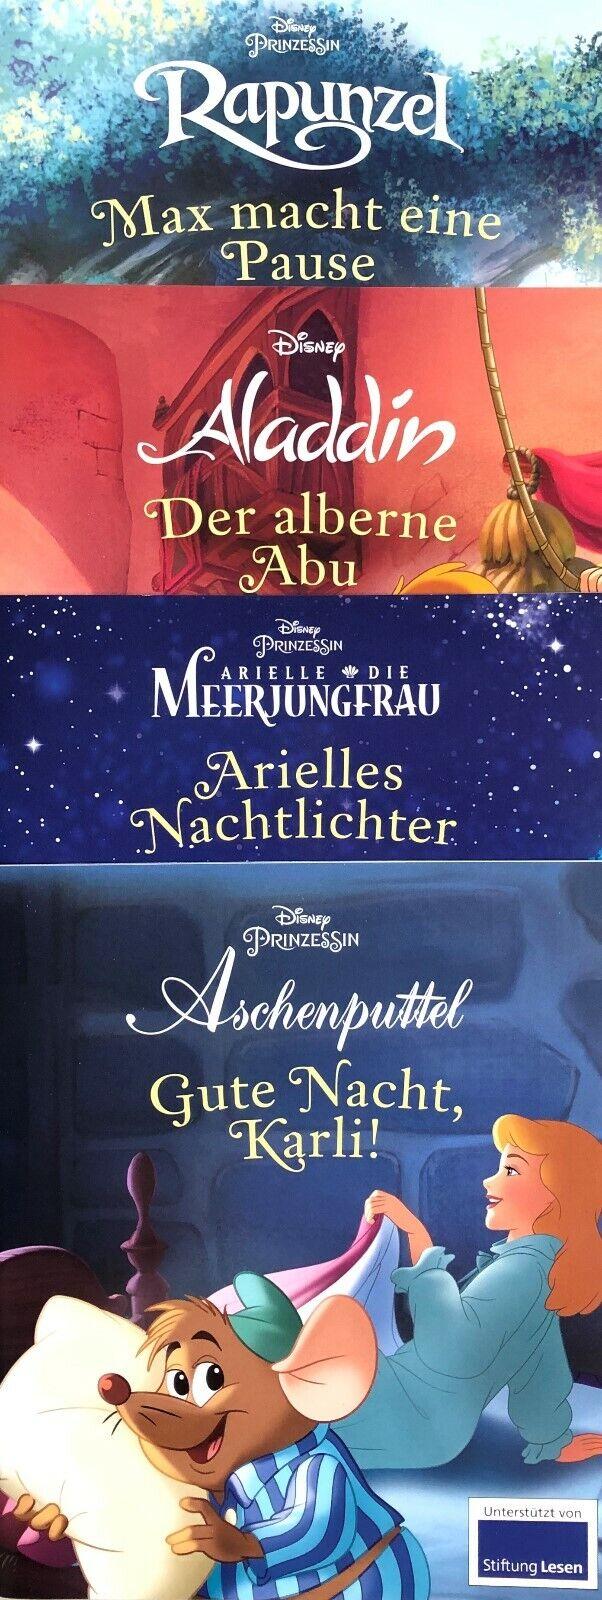 Kinderbuch Disney 4er Bücherset 4 märchenhafte Geschichten